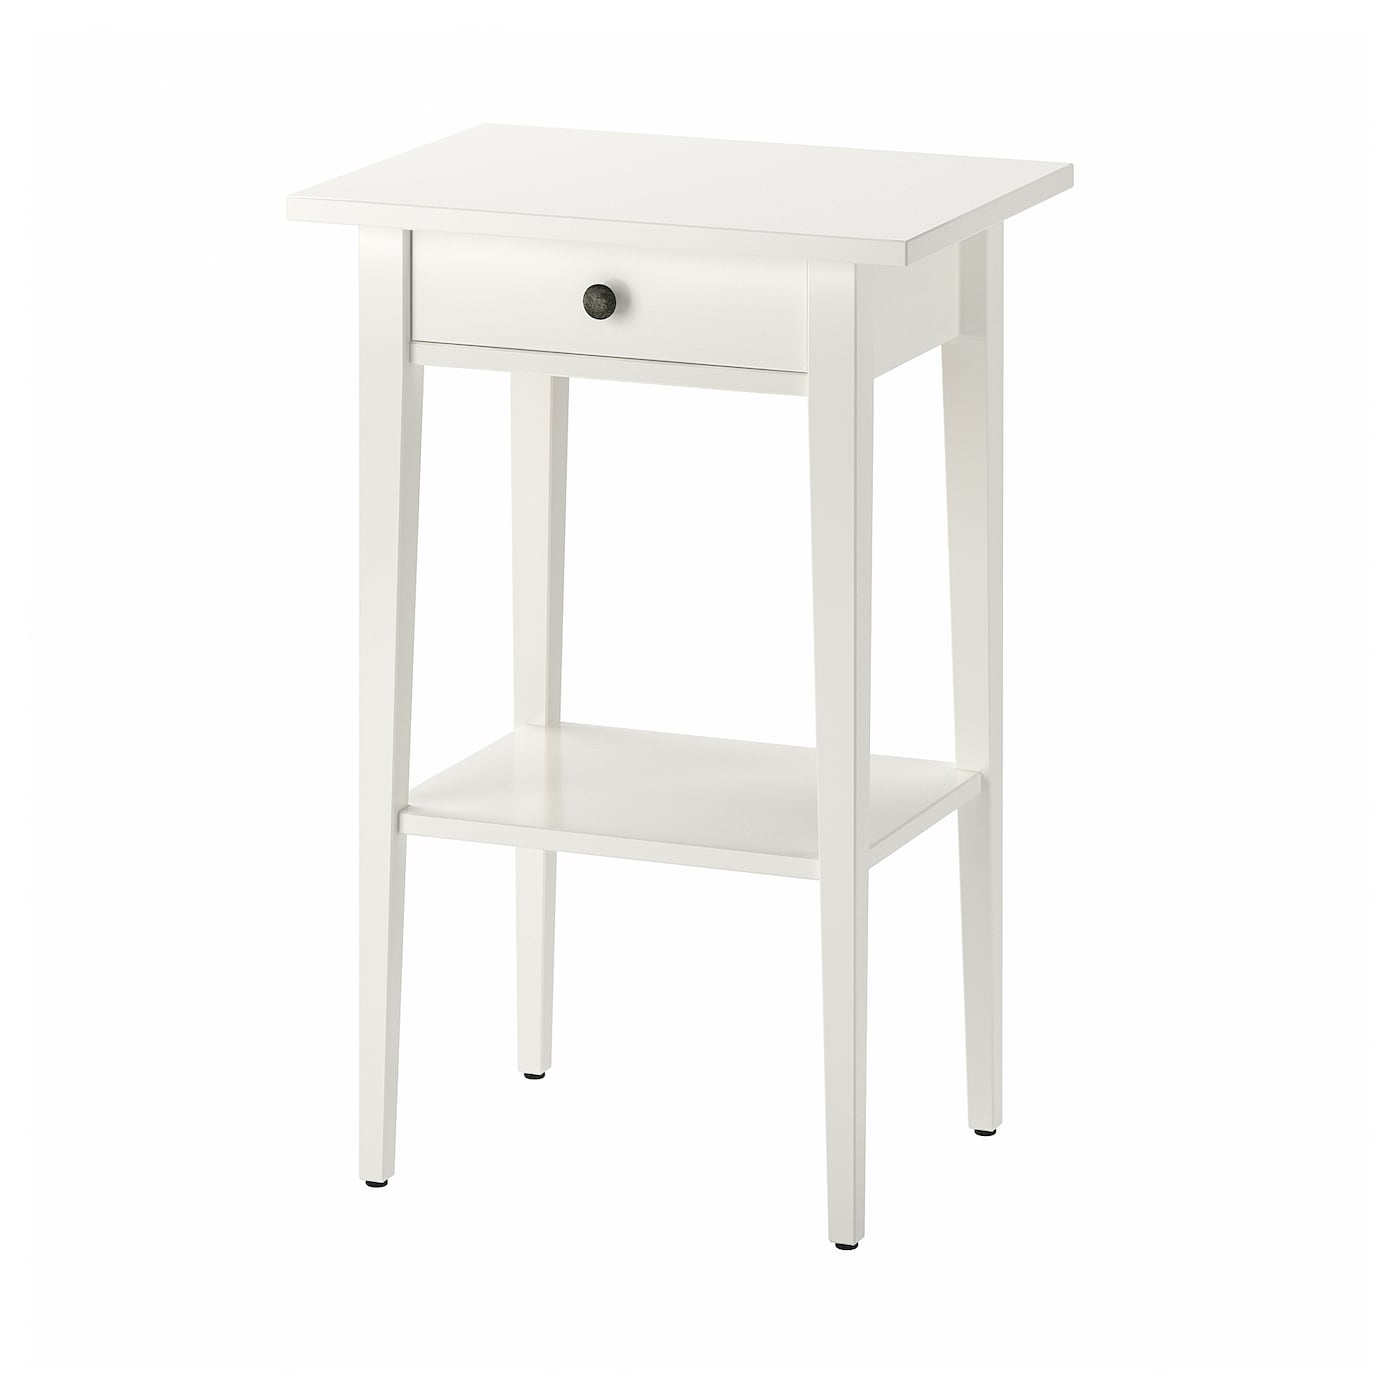 Hemnes Bedside Table White 46x35 Cm Ikea Ireland